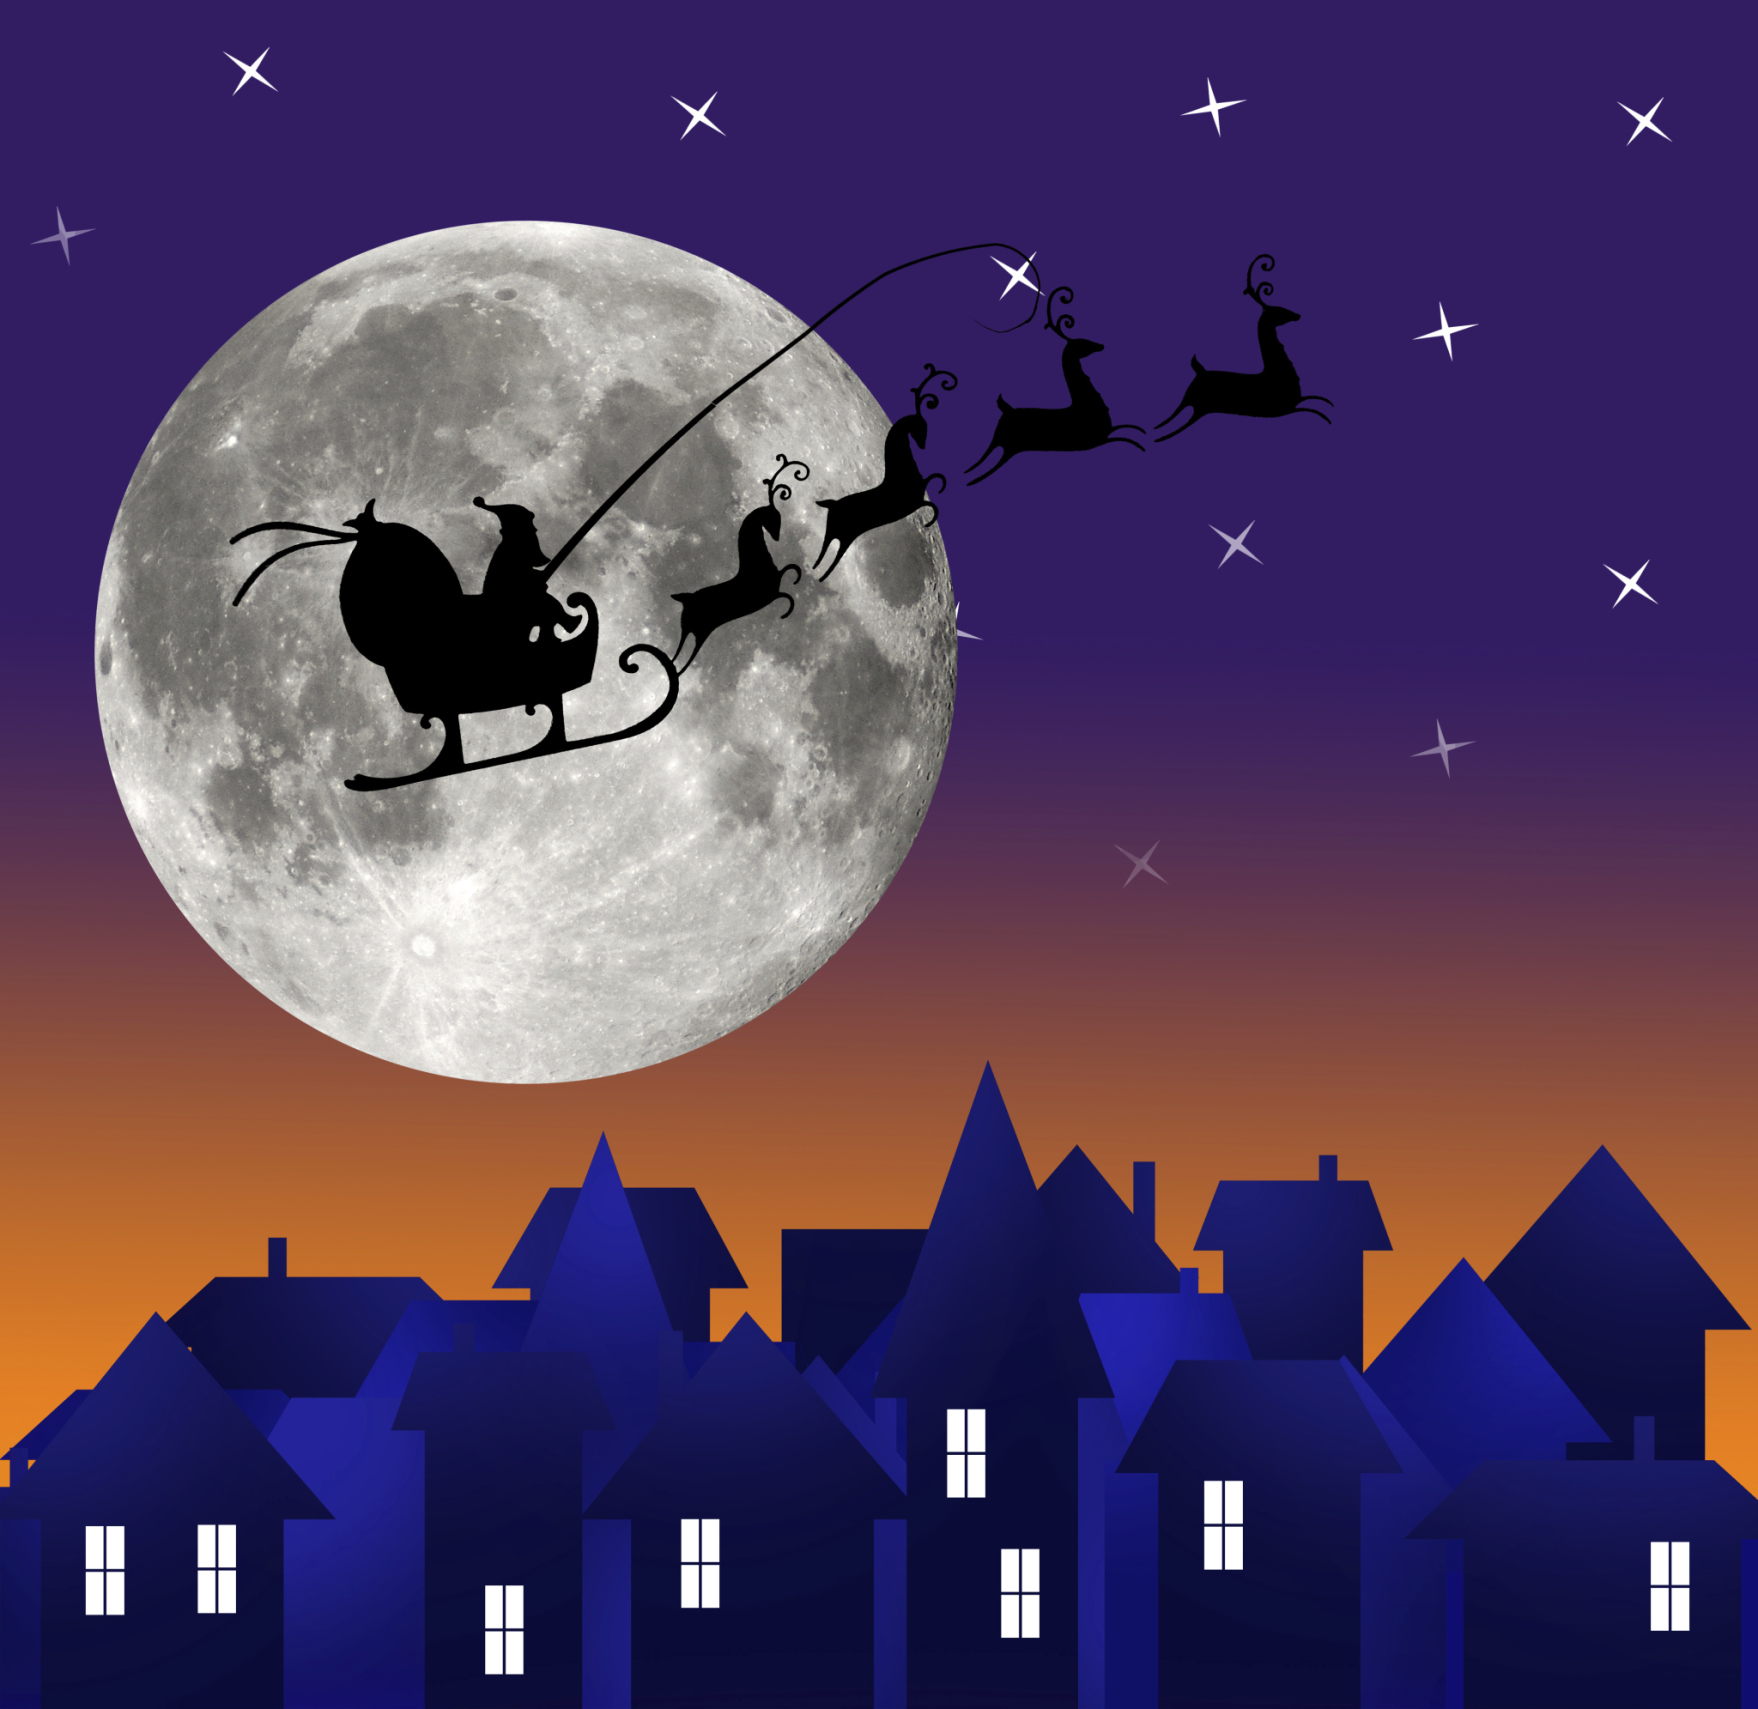 Santas Sleigh Flies At Night